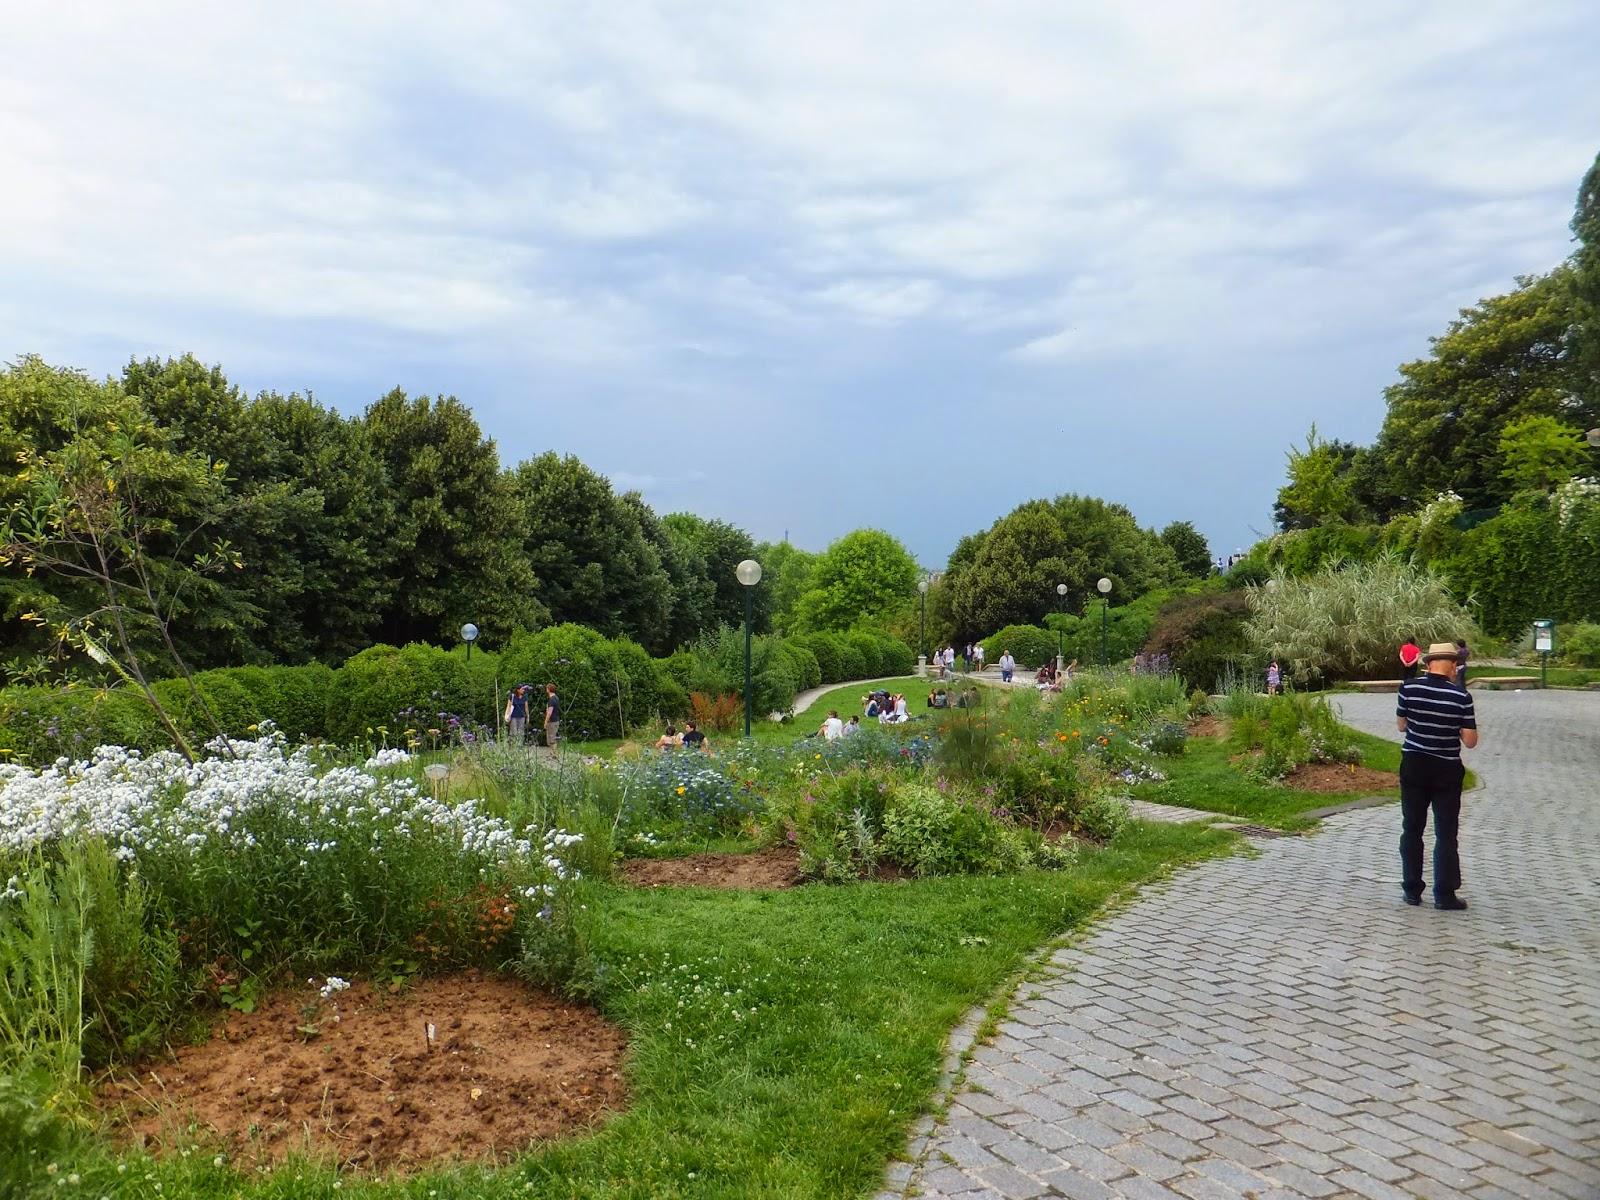 Parque de Belleville, París, Elisa N, Blog de Viajes